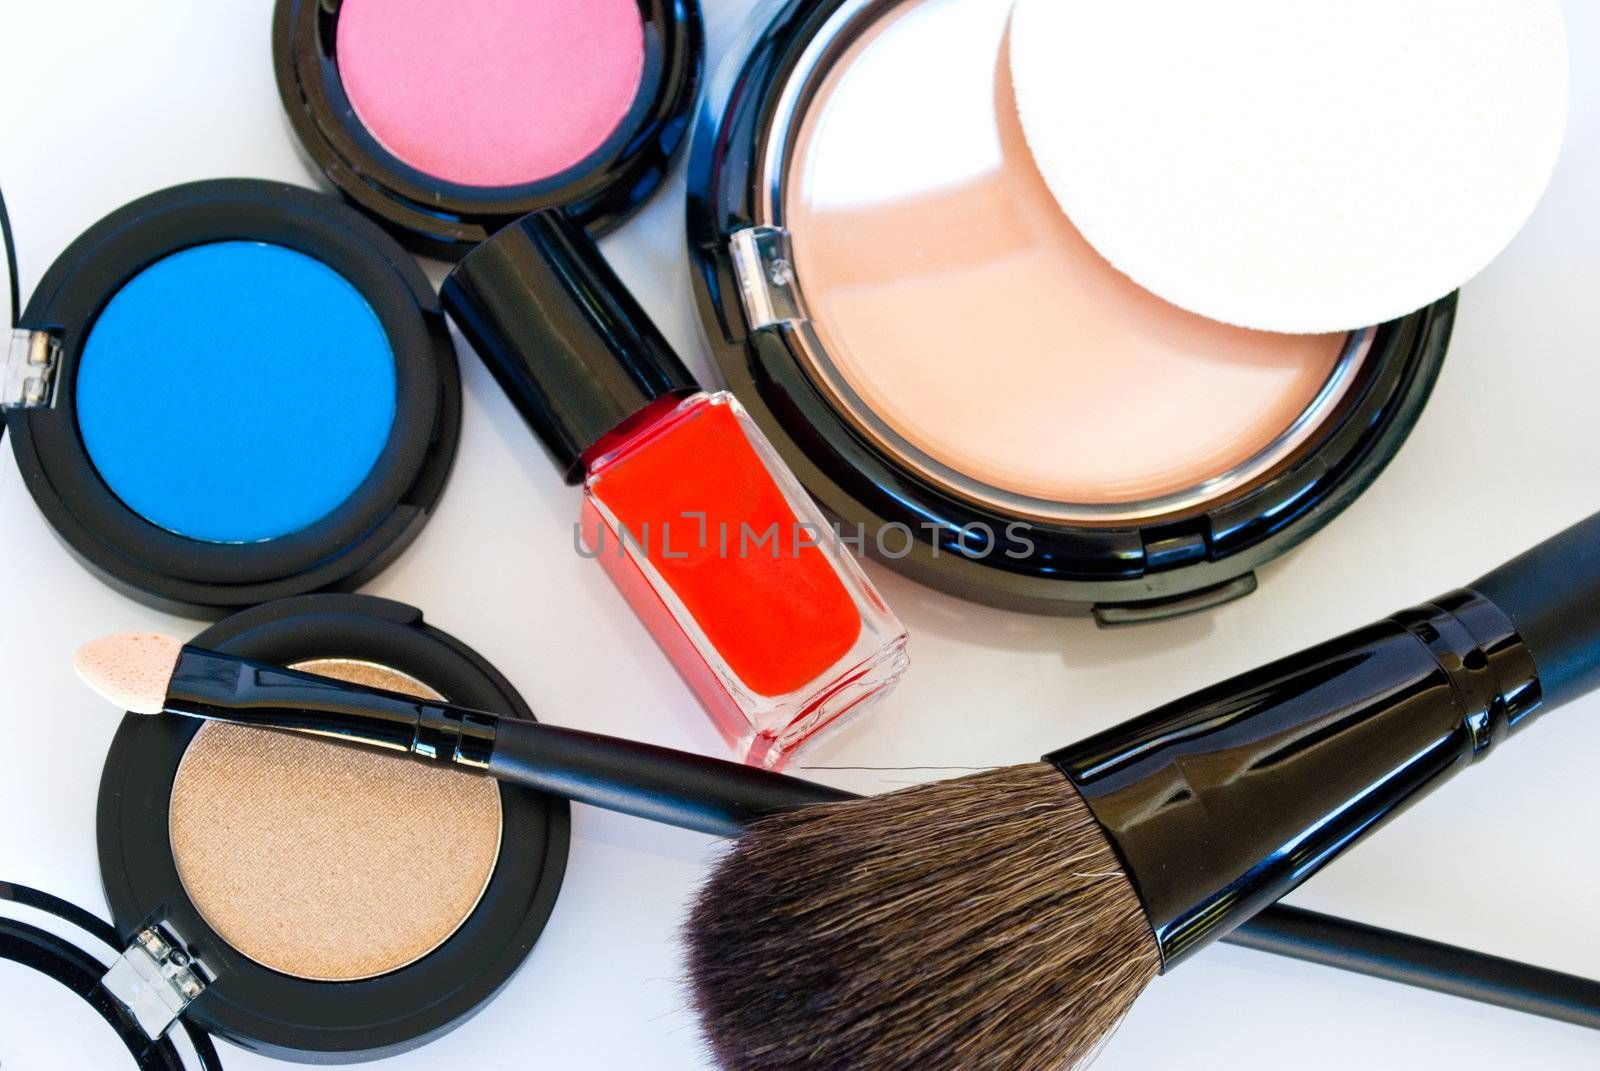 Makeup, Eye shadows, brush,foundation,blush